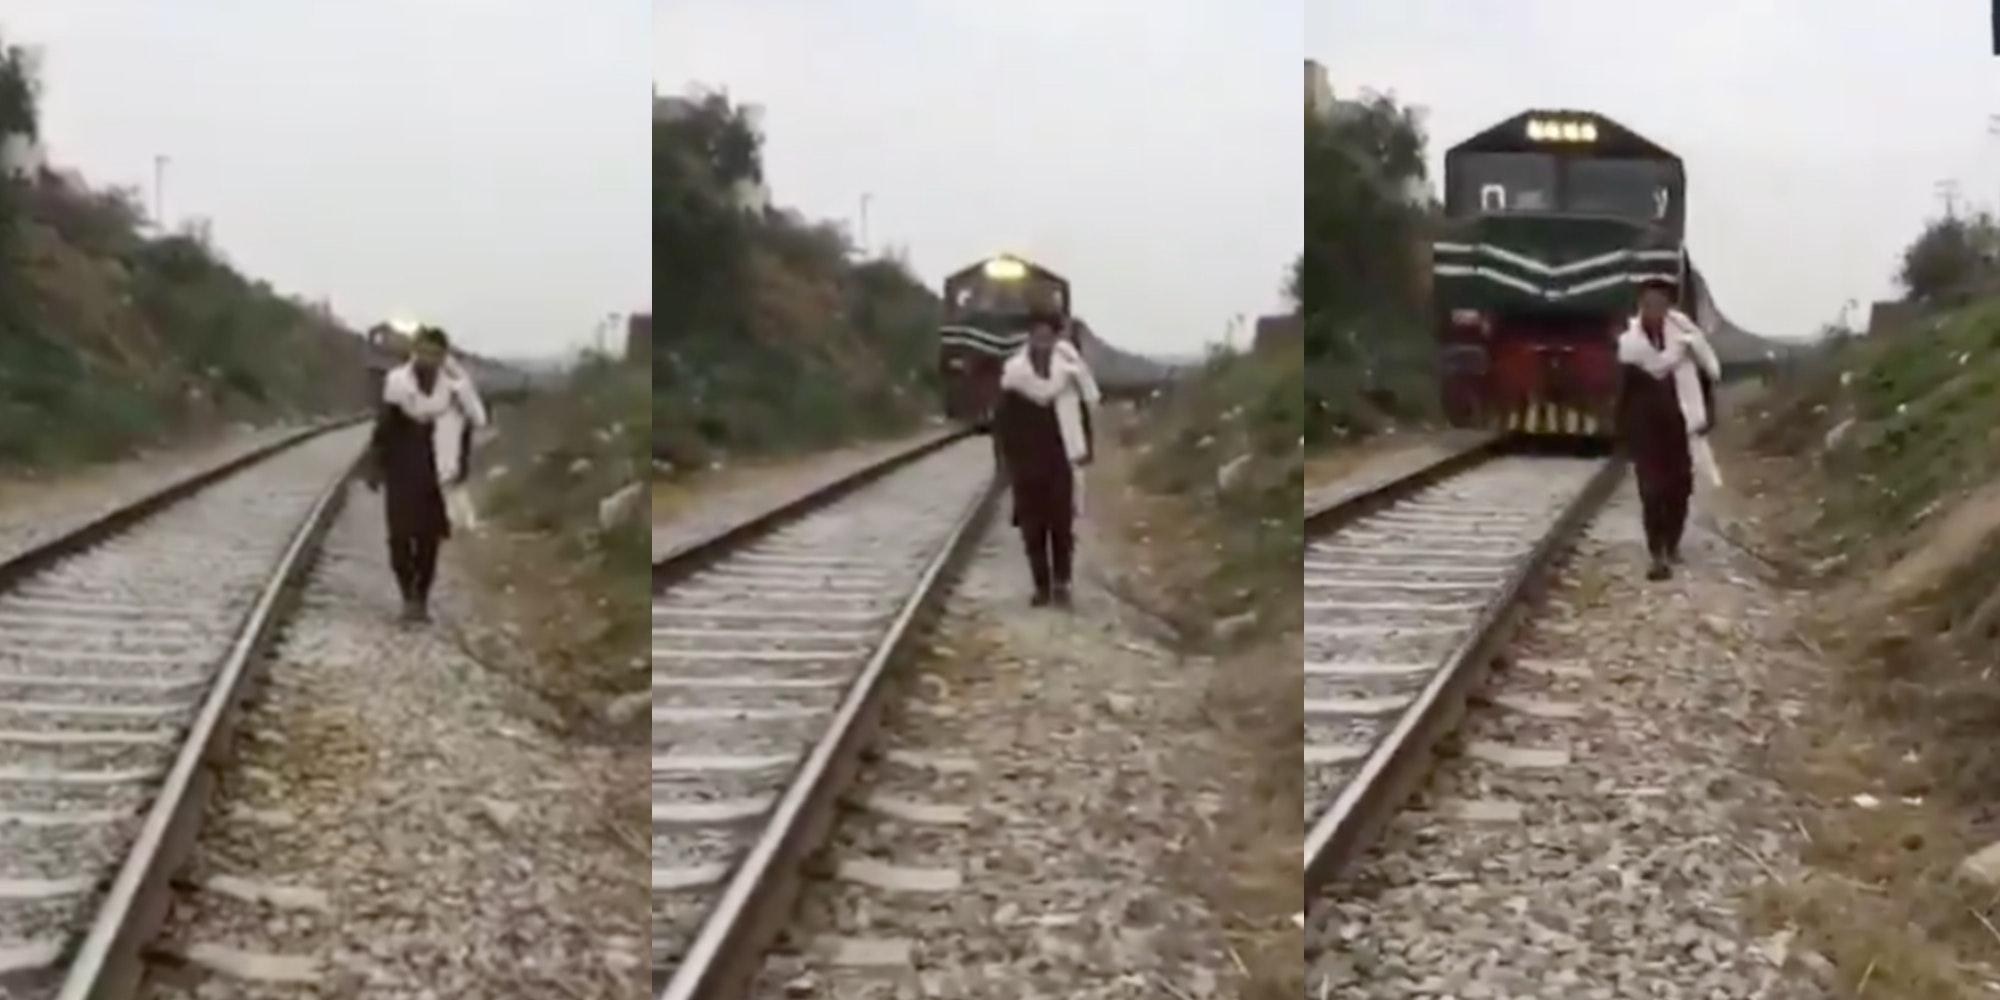 tiktoker killed by train video